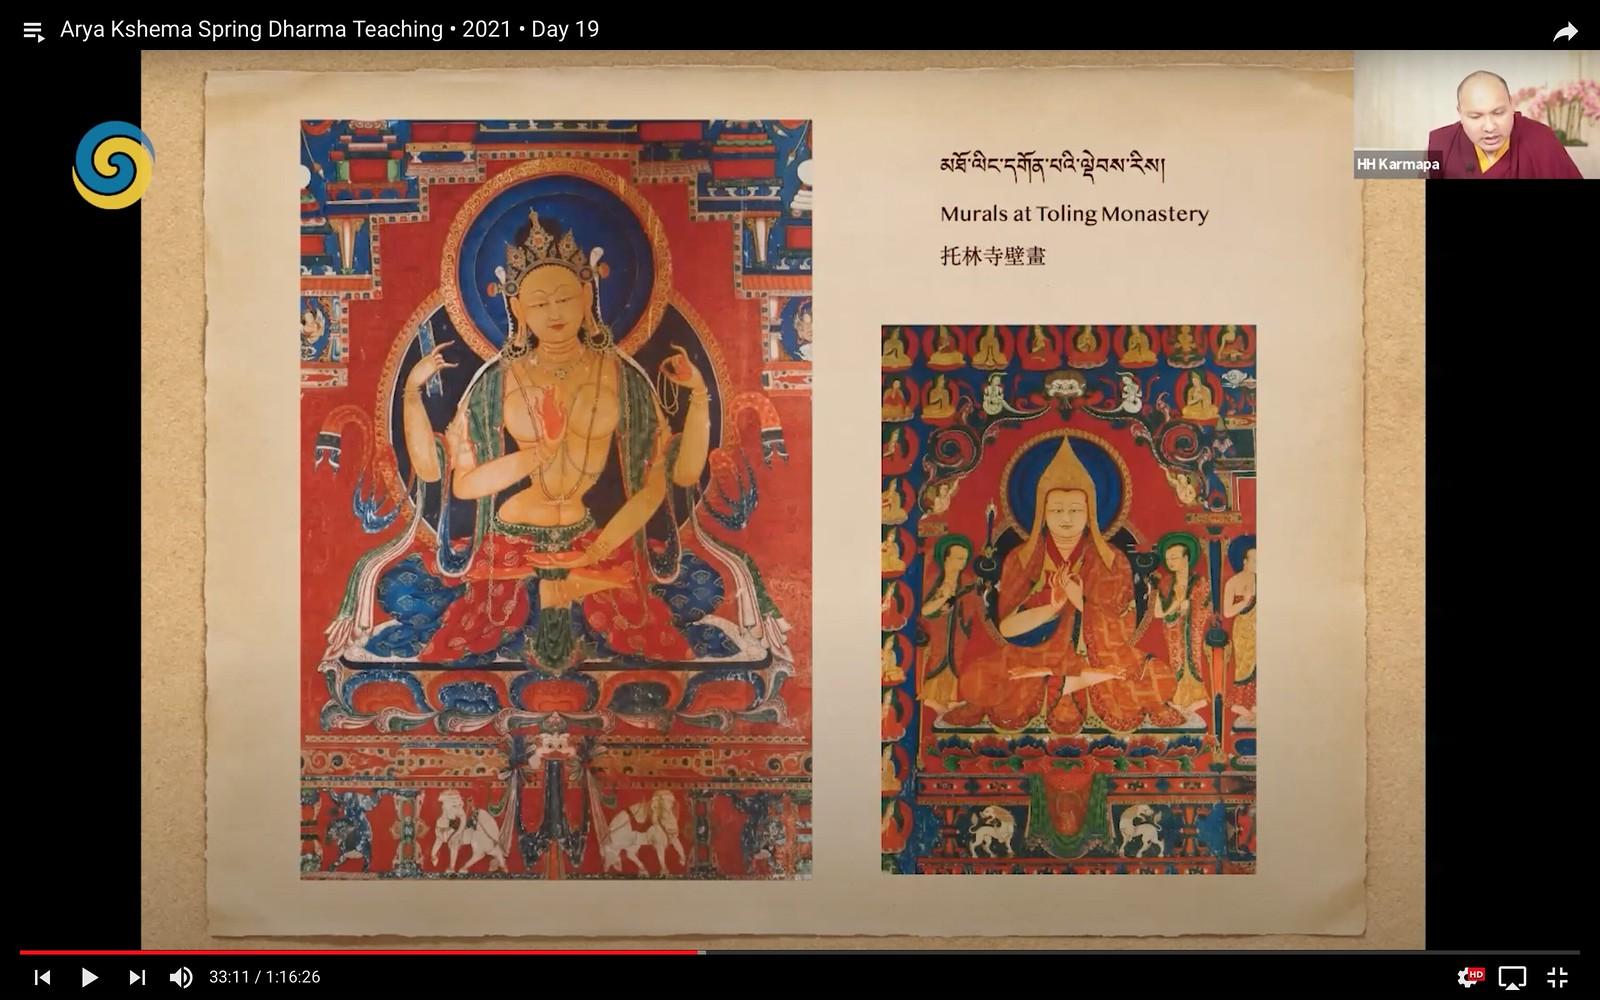 2021.03.16 Day 19: Tibetan Art Forms: Menluk, Khyenluk and Gardri